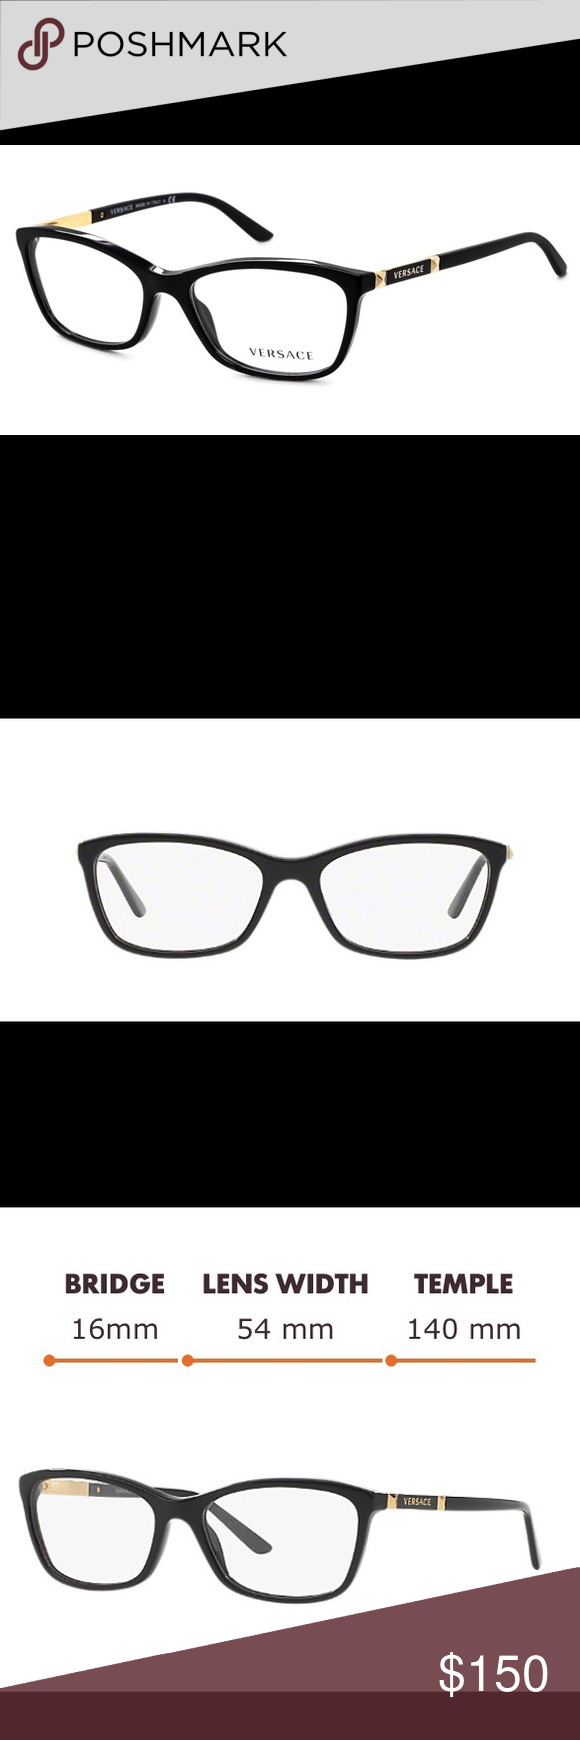 4b6636b0abf2 Versace Eyeglasses VE 3186 Black Versace Eyeglasses VE 3186 Black GB1 52mm.  Originally  225. Excellent condition! Just need to change the lenses!